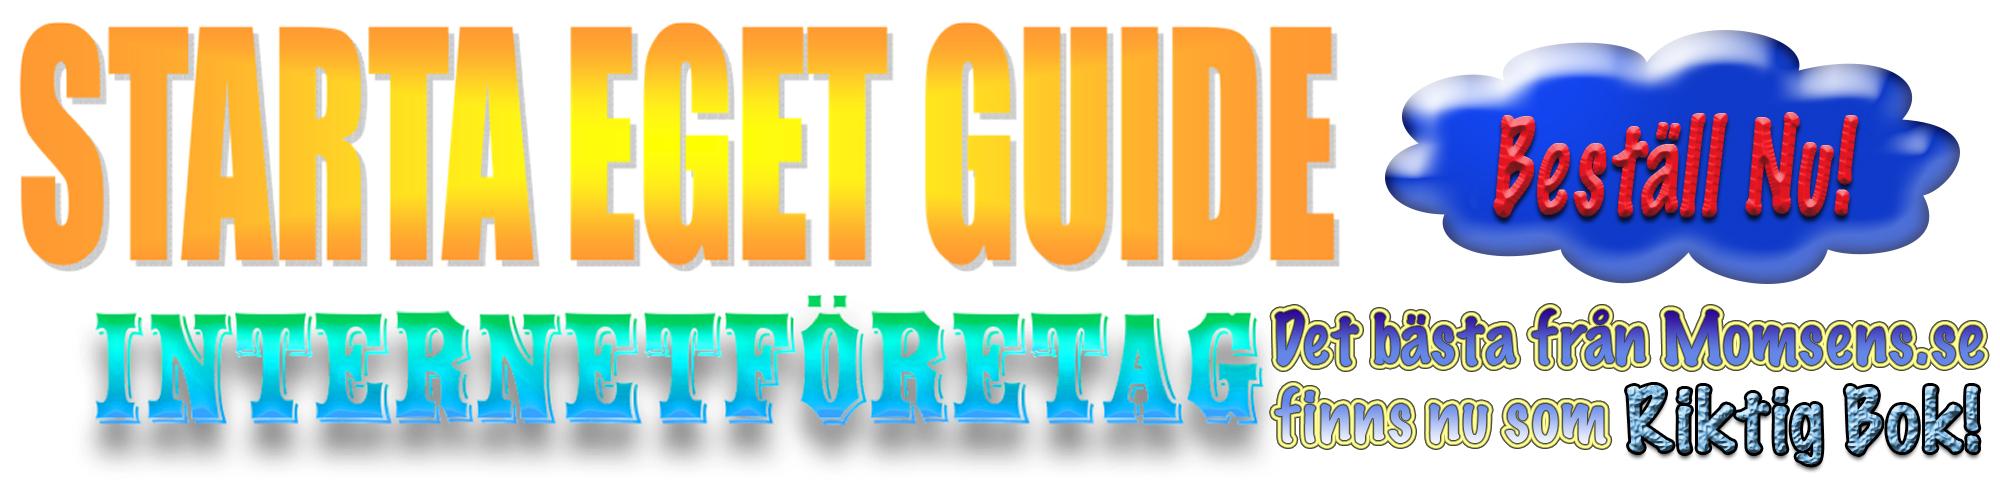 Starta Eget Guide reklambanner Tryckt bok